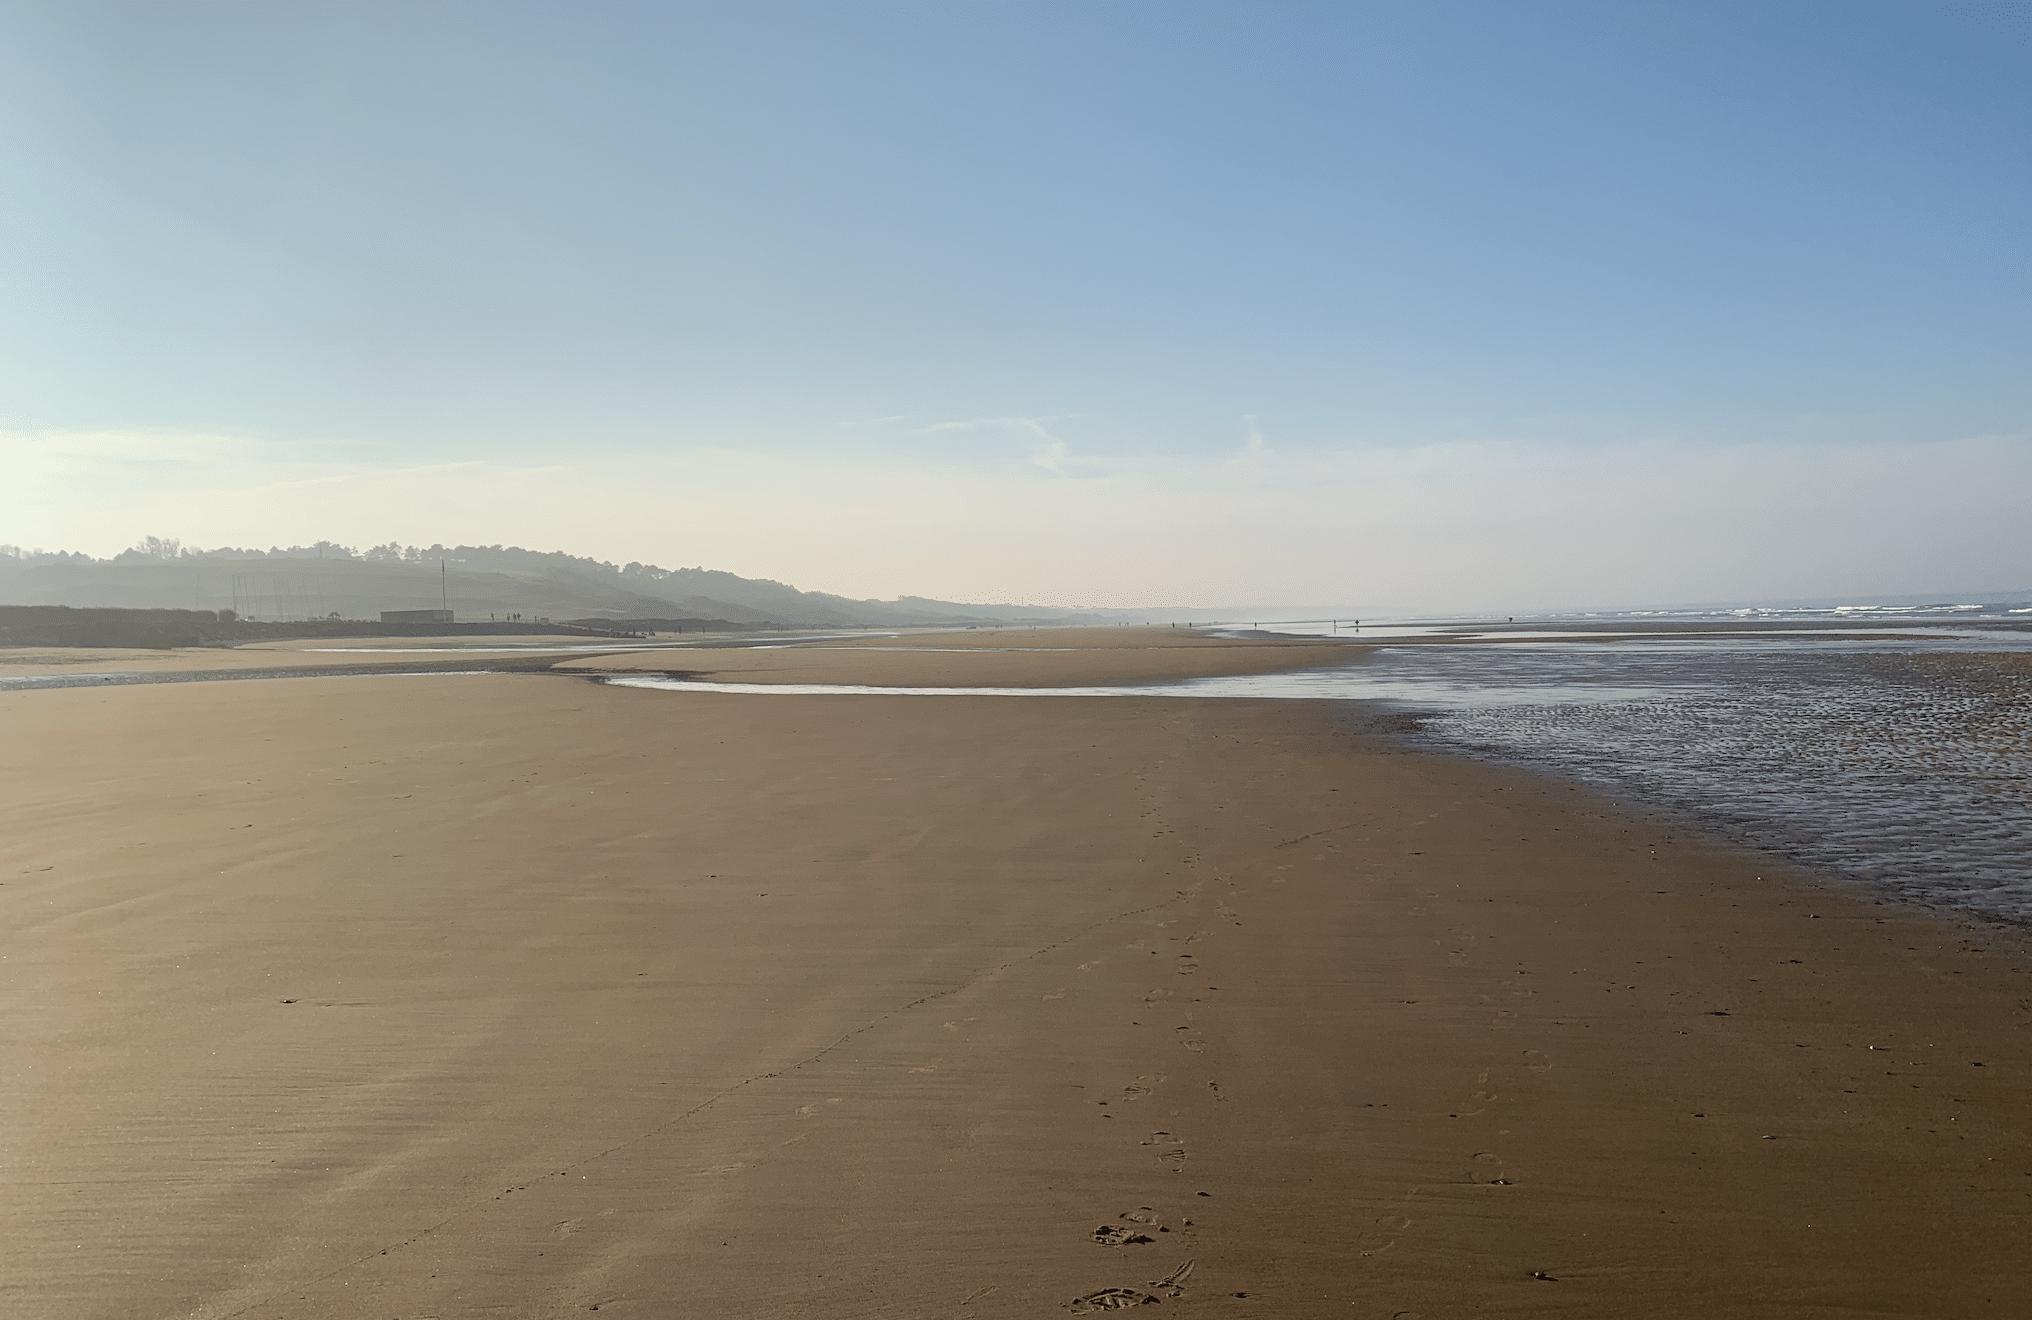 la plage d'omaha beach en normandie